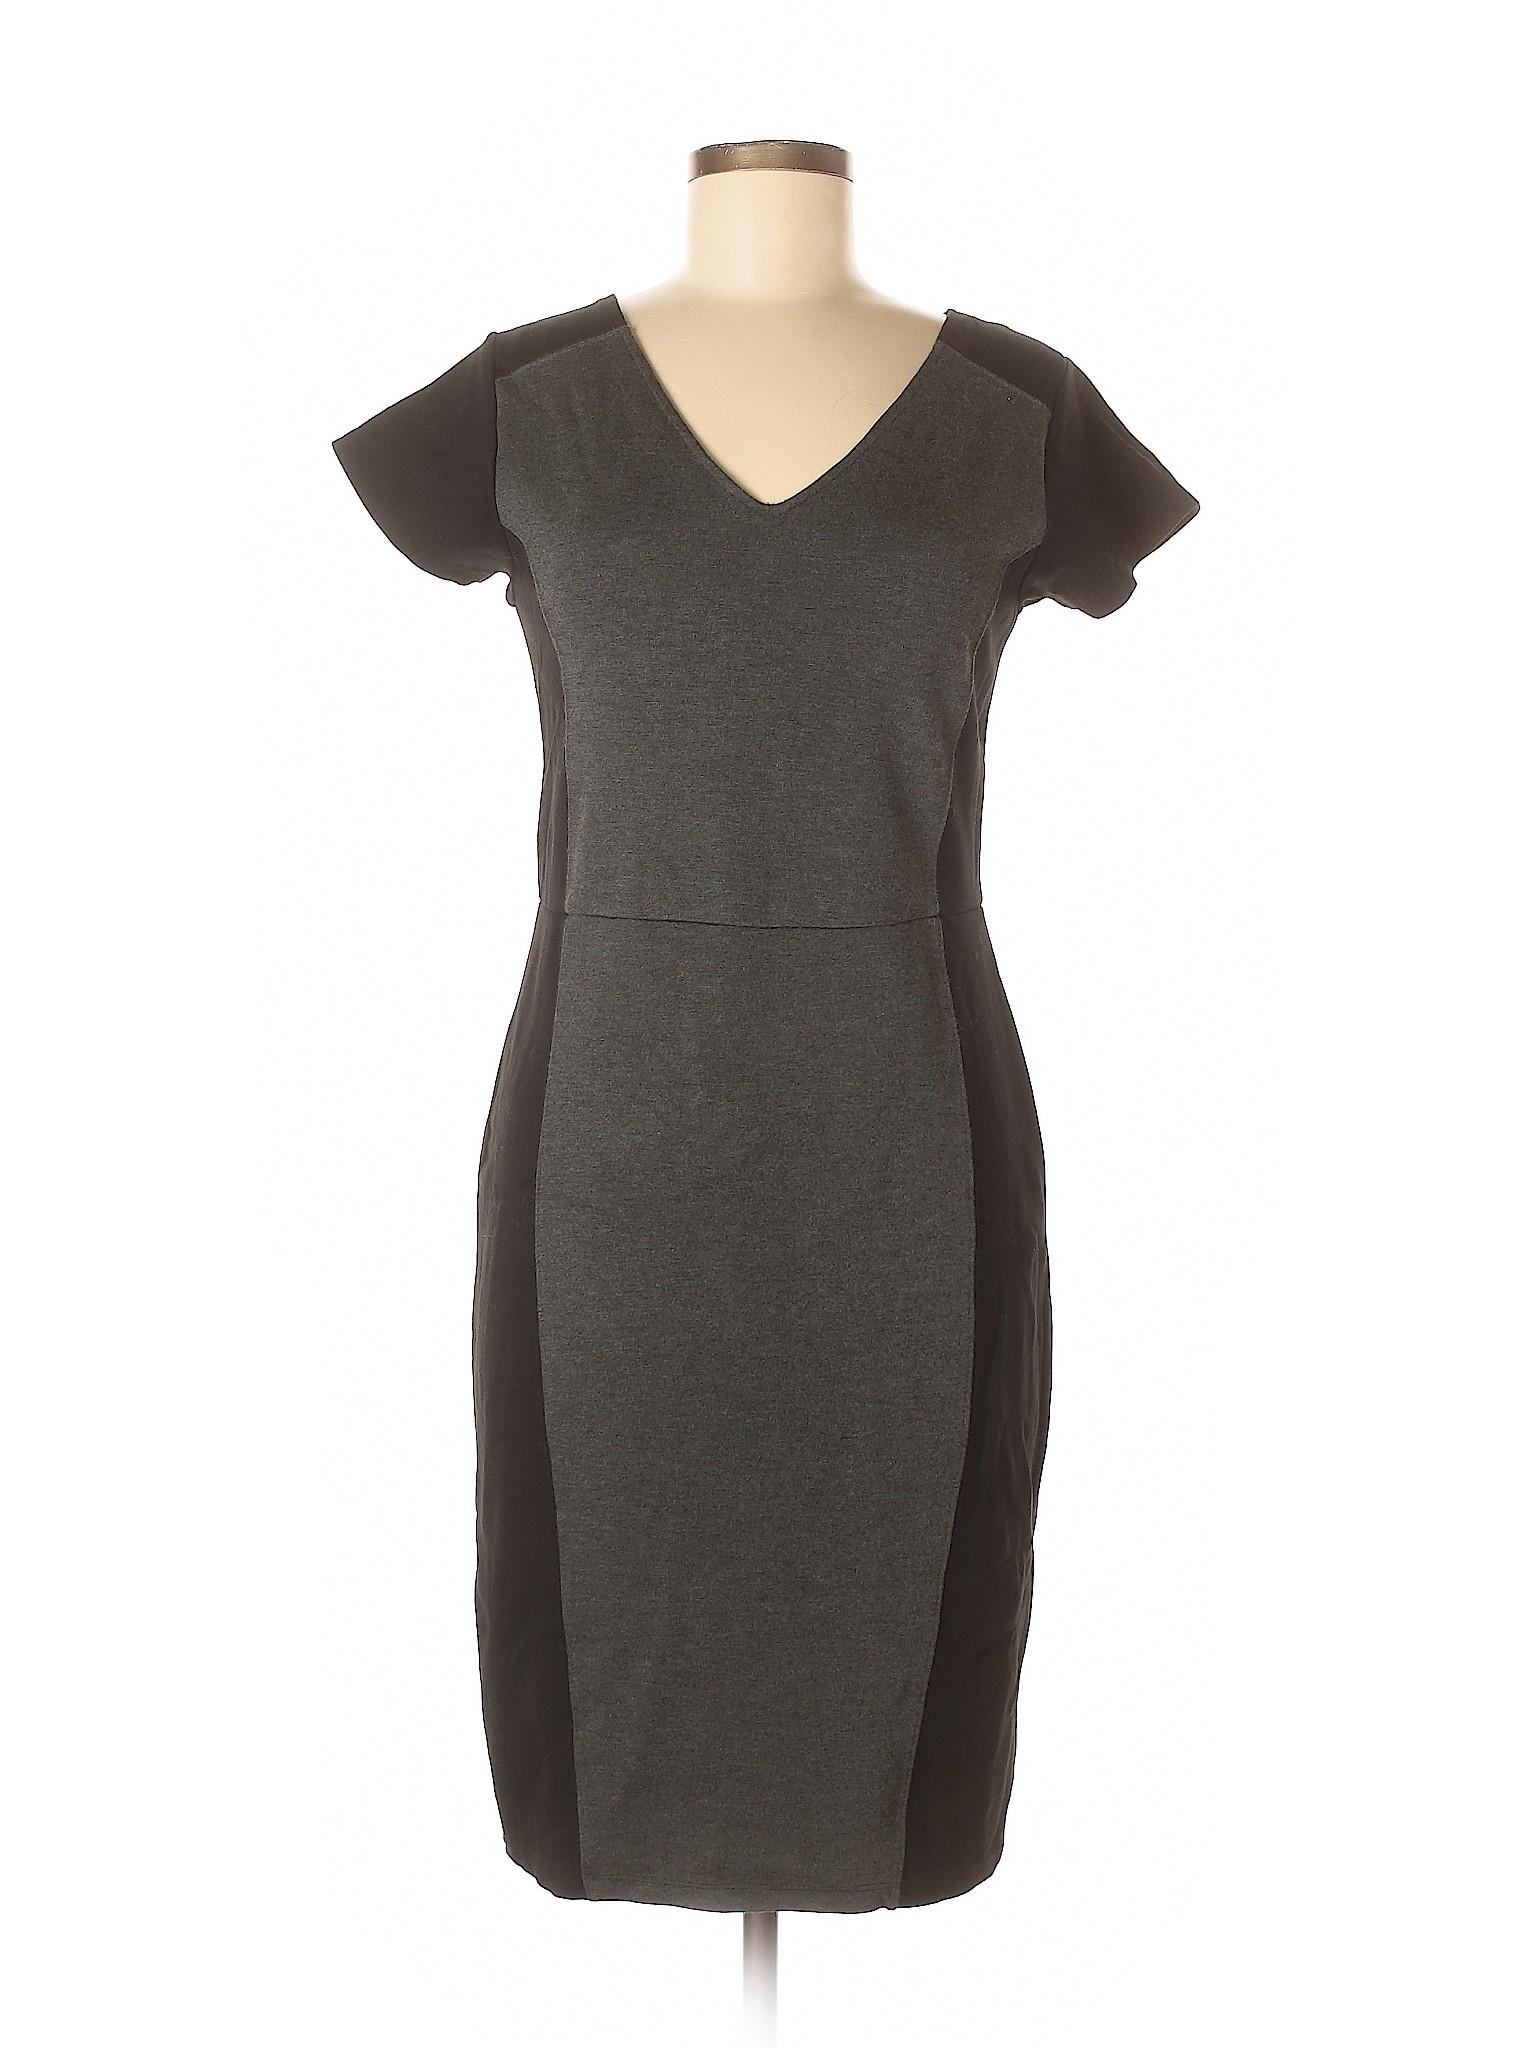 Boutique winter Casual Ruby Dress Ribbon SS8qzwr